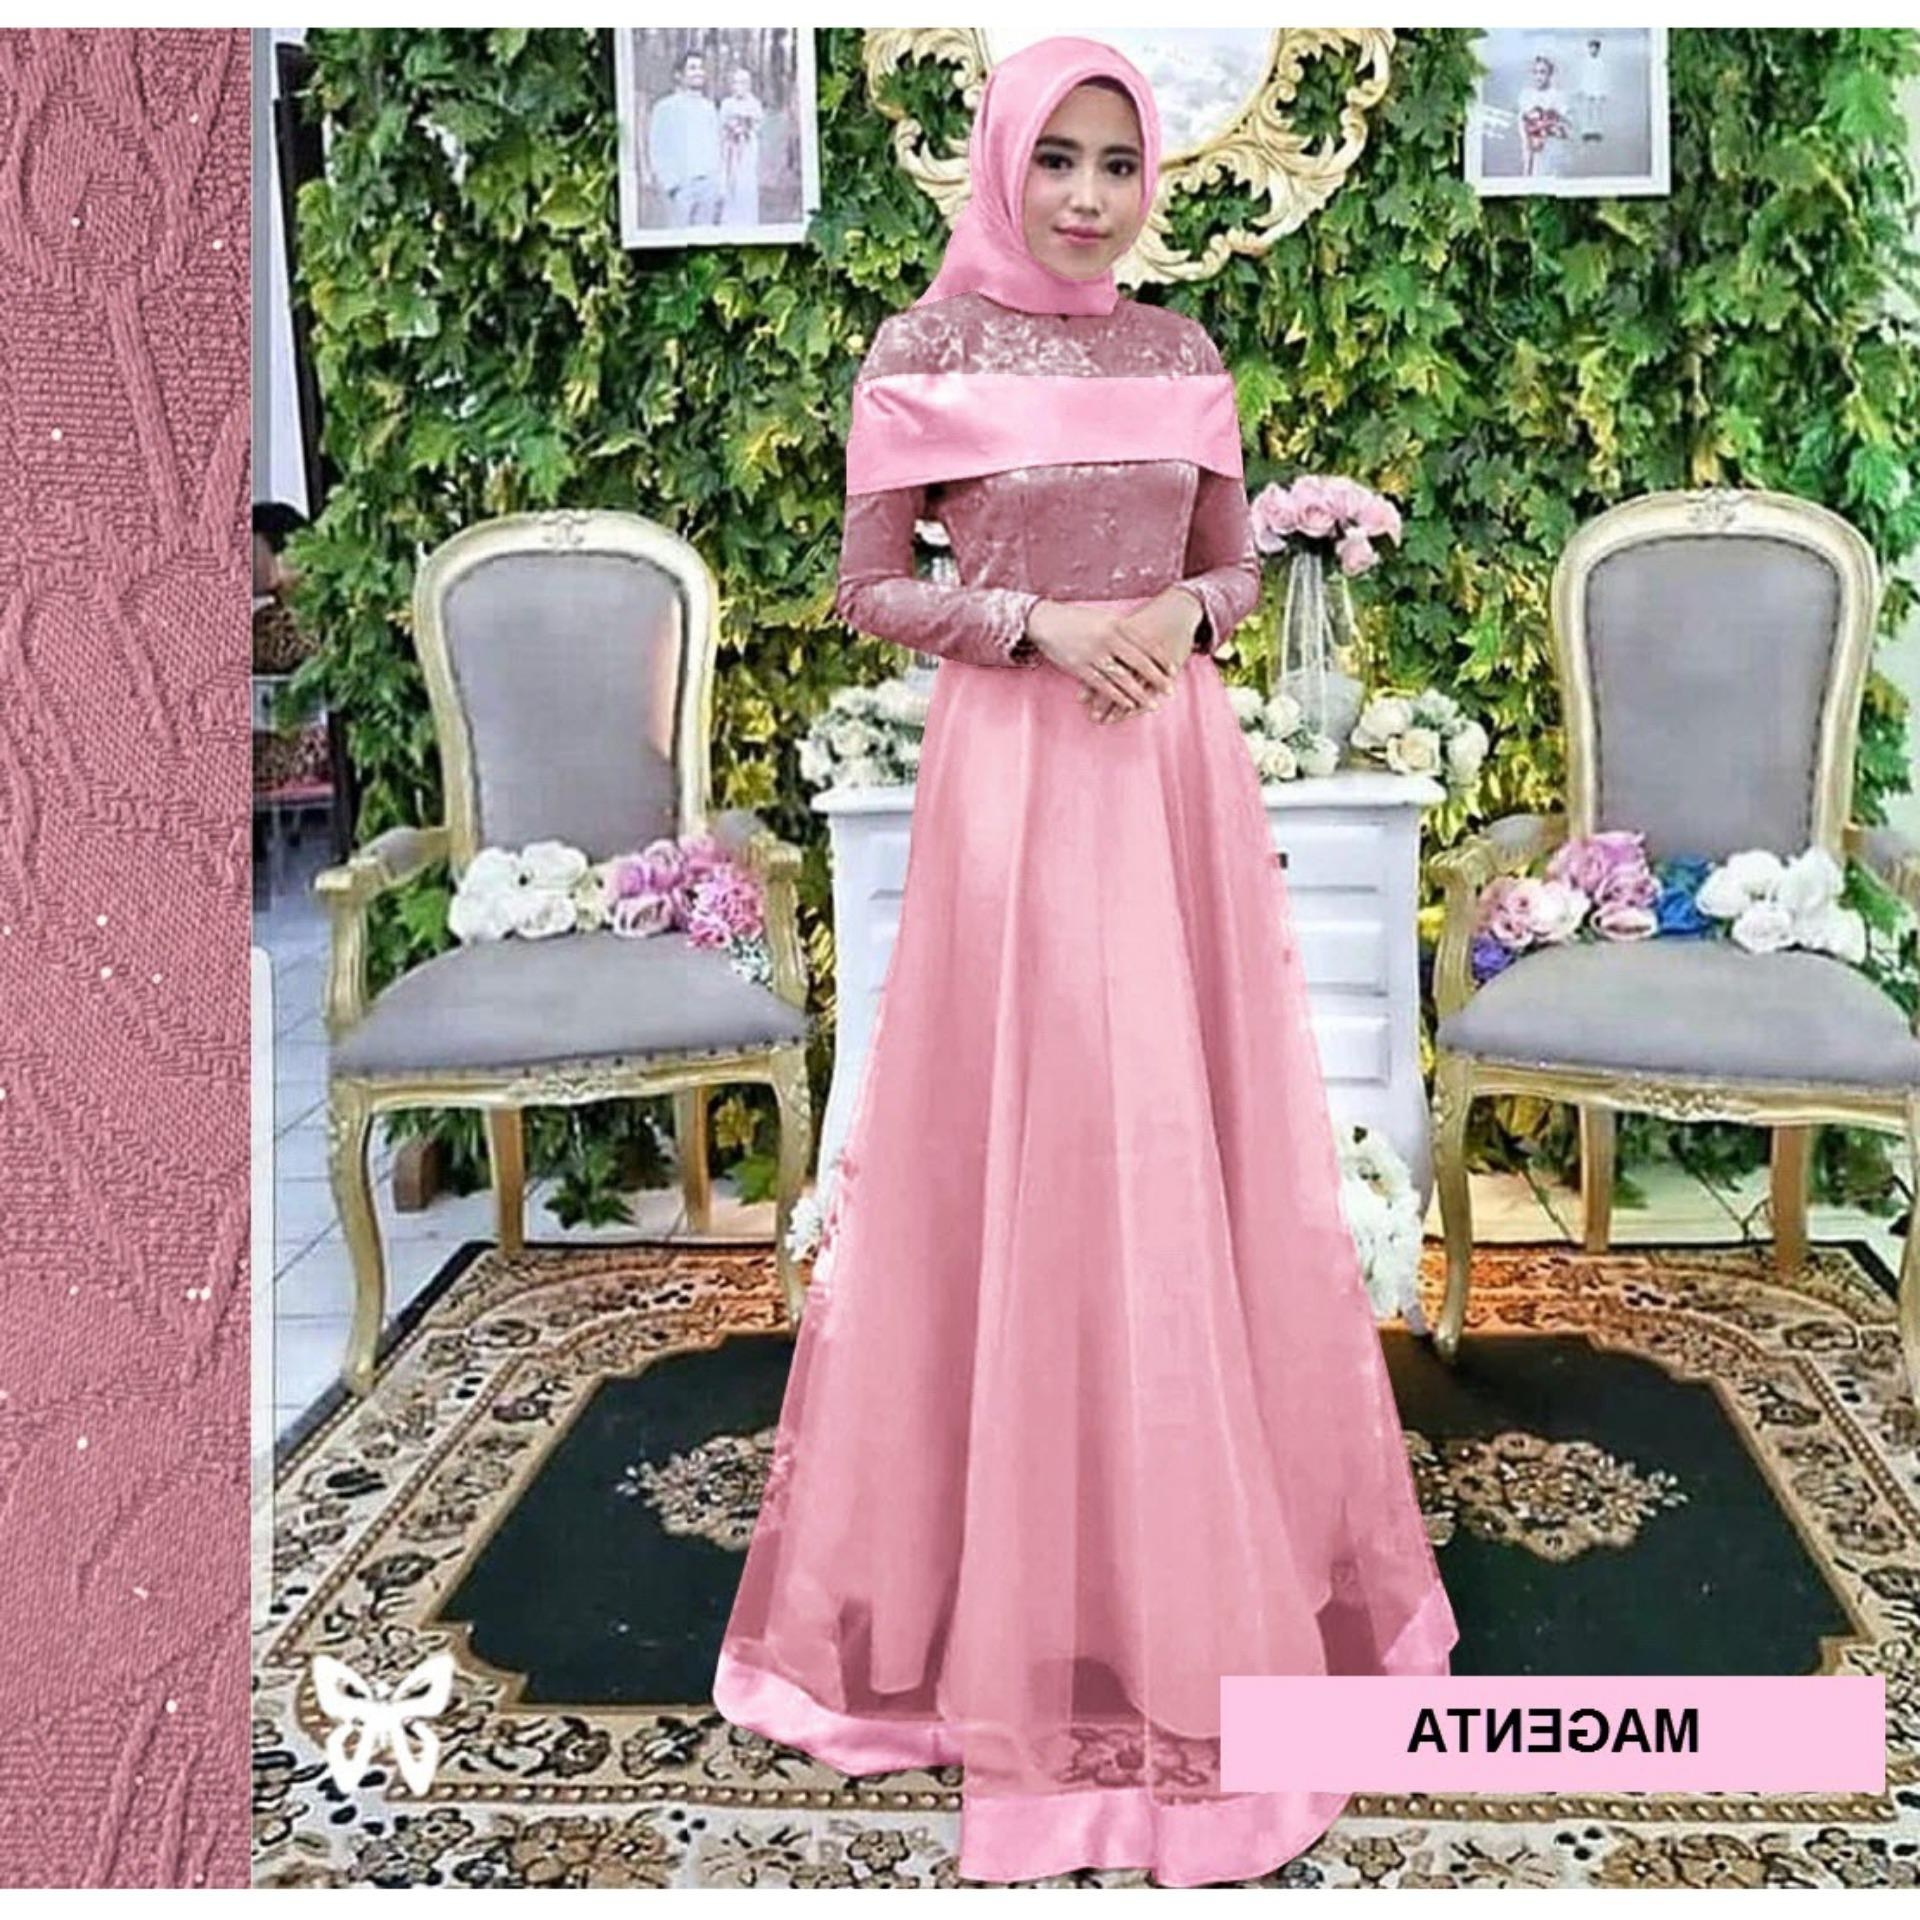 Design Lazada Baju Lebaran E9dx Gamis Brokat Terbaru 2019 Lazada Gambar islami